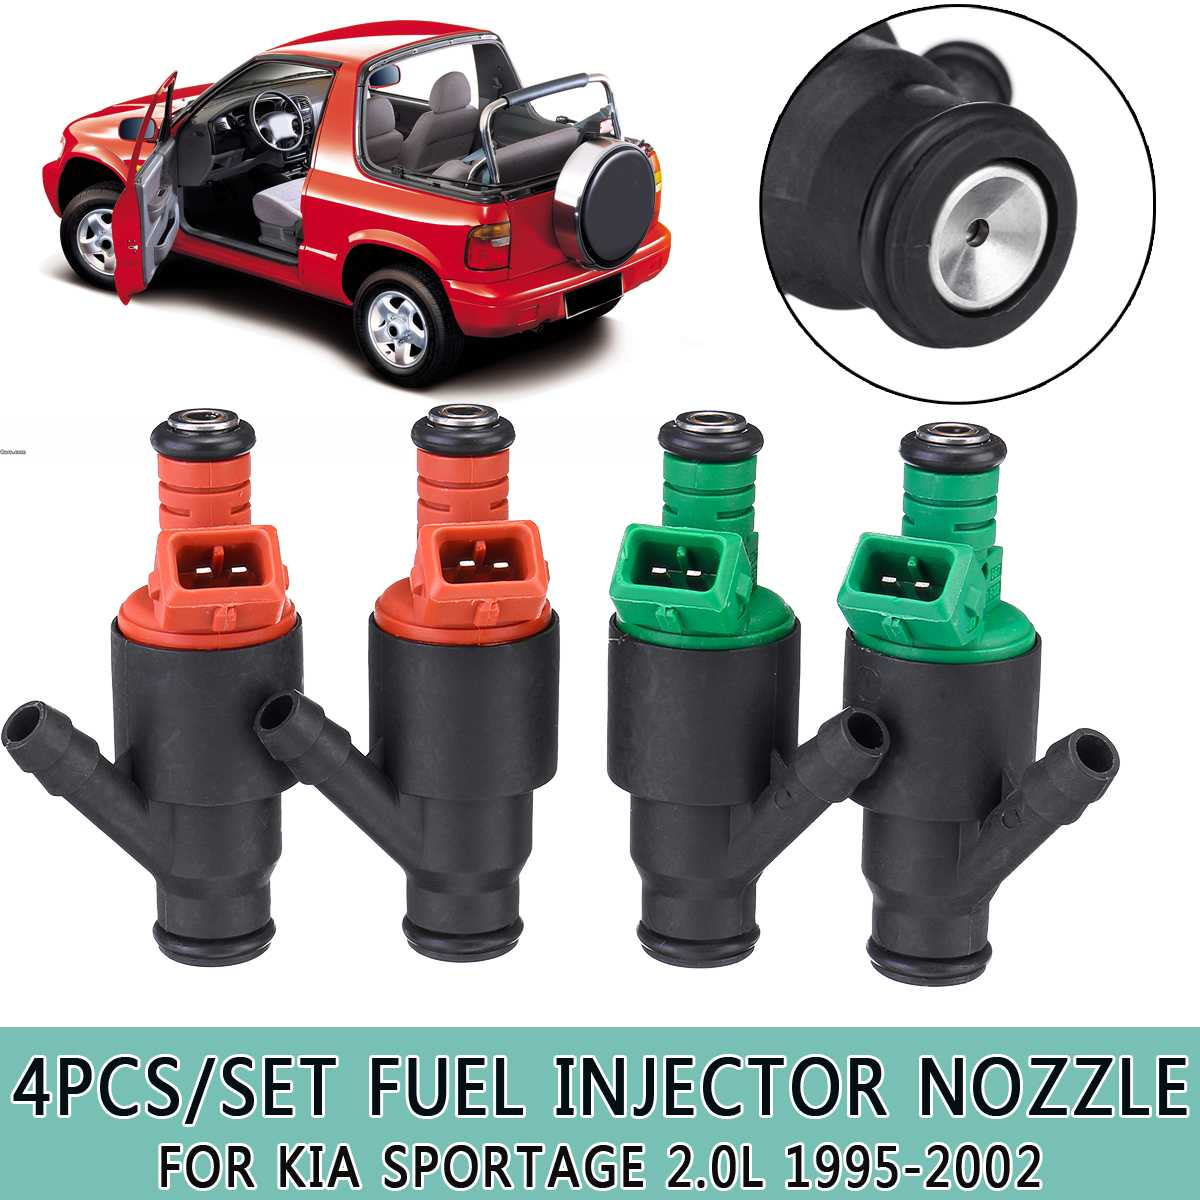 Fuel Injector Connector Harness Pigtail Replaces 1P1575 NEW For Chevrolet GMC Express 3500 Impala S10 Silverado 2500 Silverado 2500 HD Buick Yukon Bonneville Pontiac Sunfire